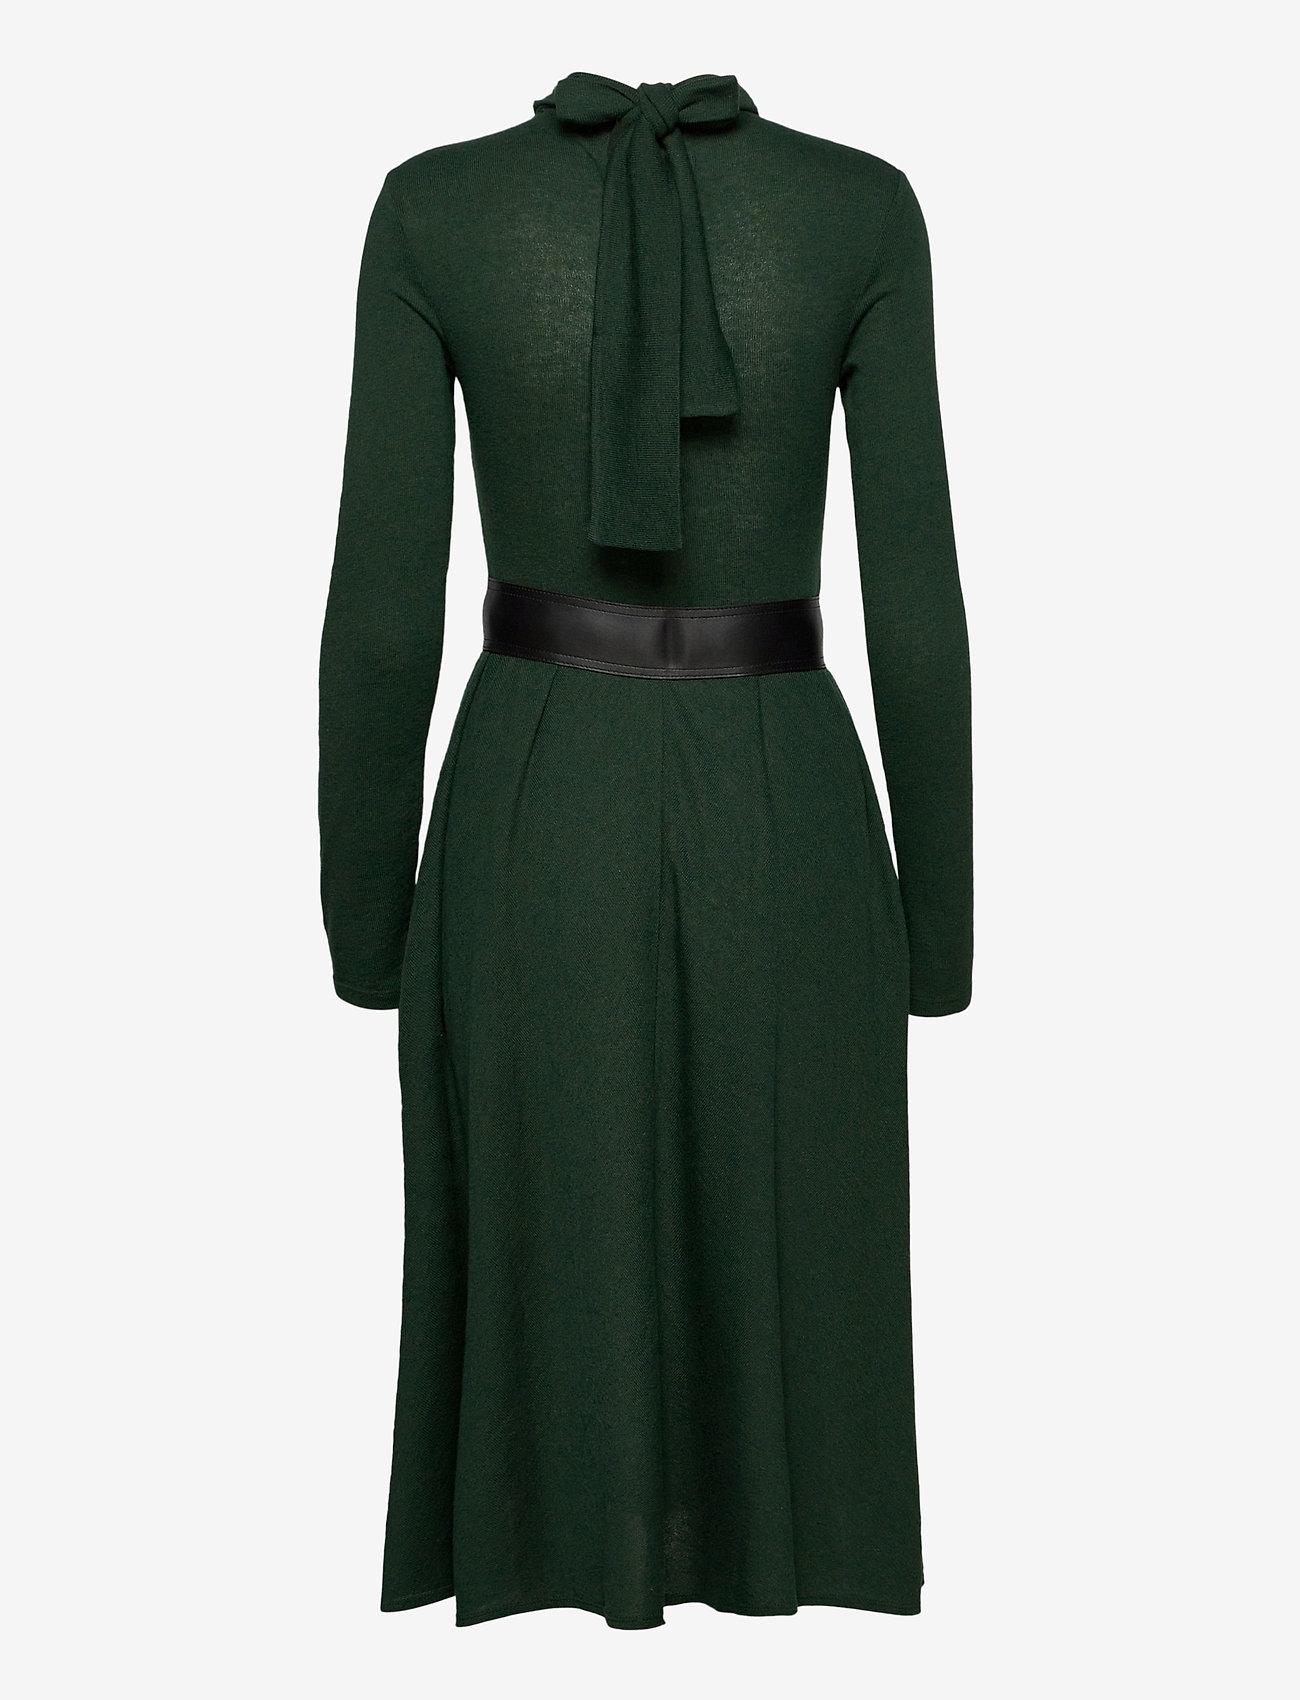 Max&Co. - DARAI - alledaagse jurken - dark green - 1